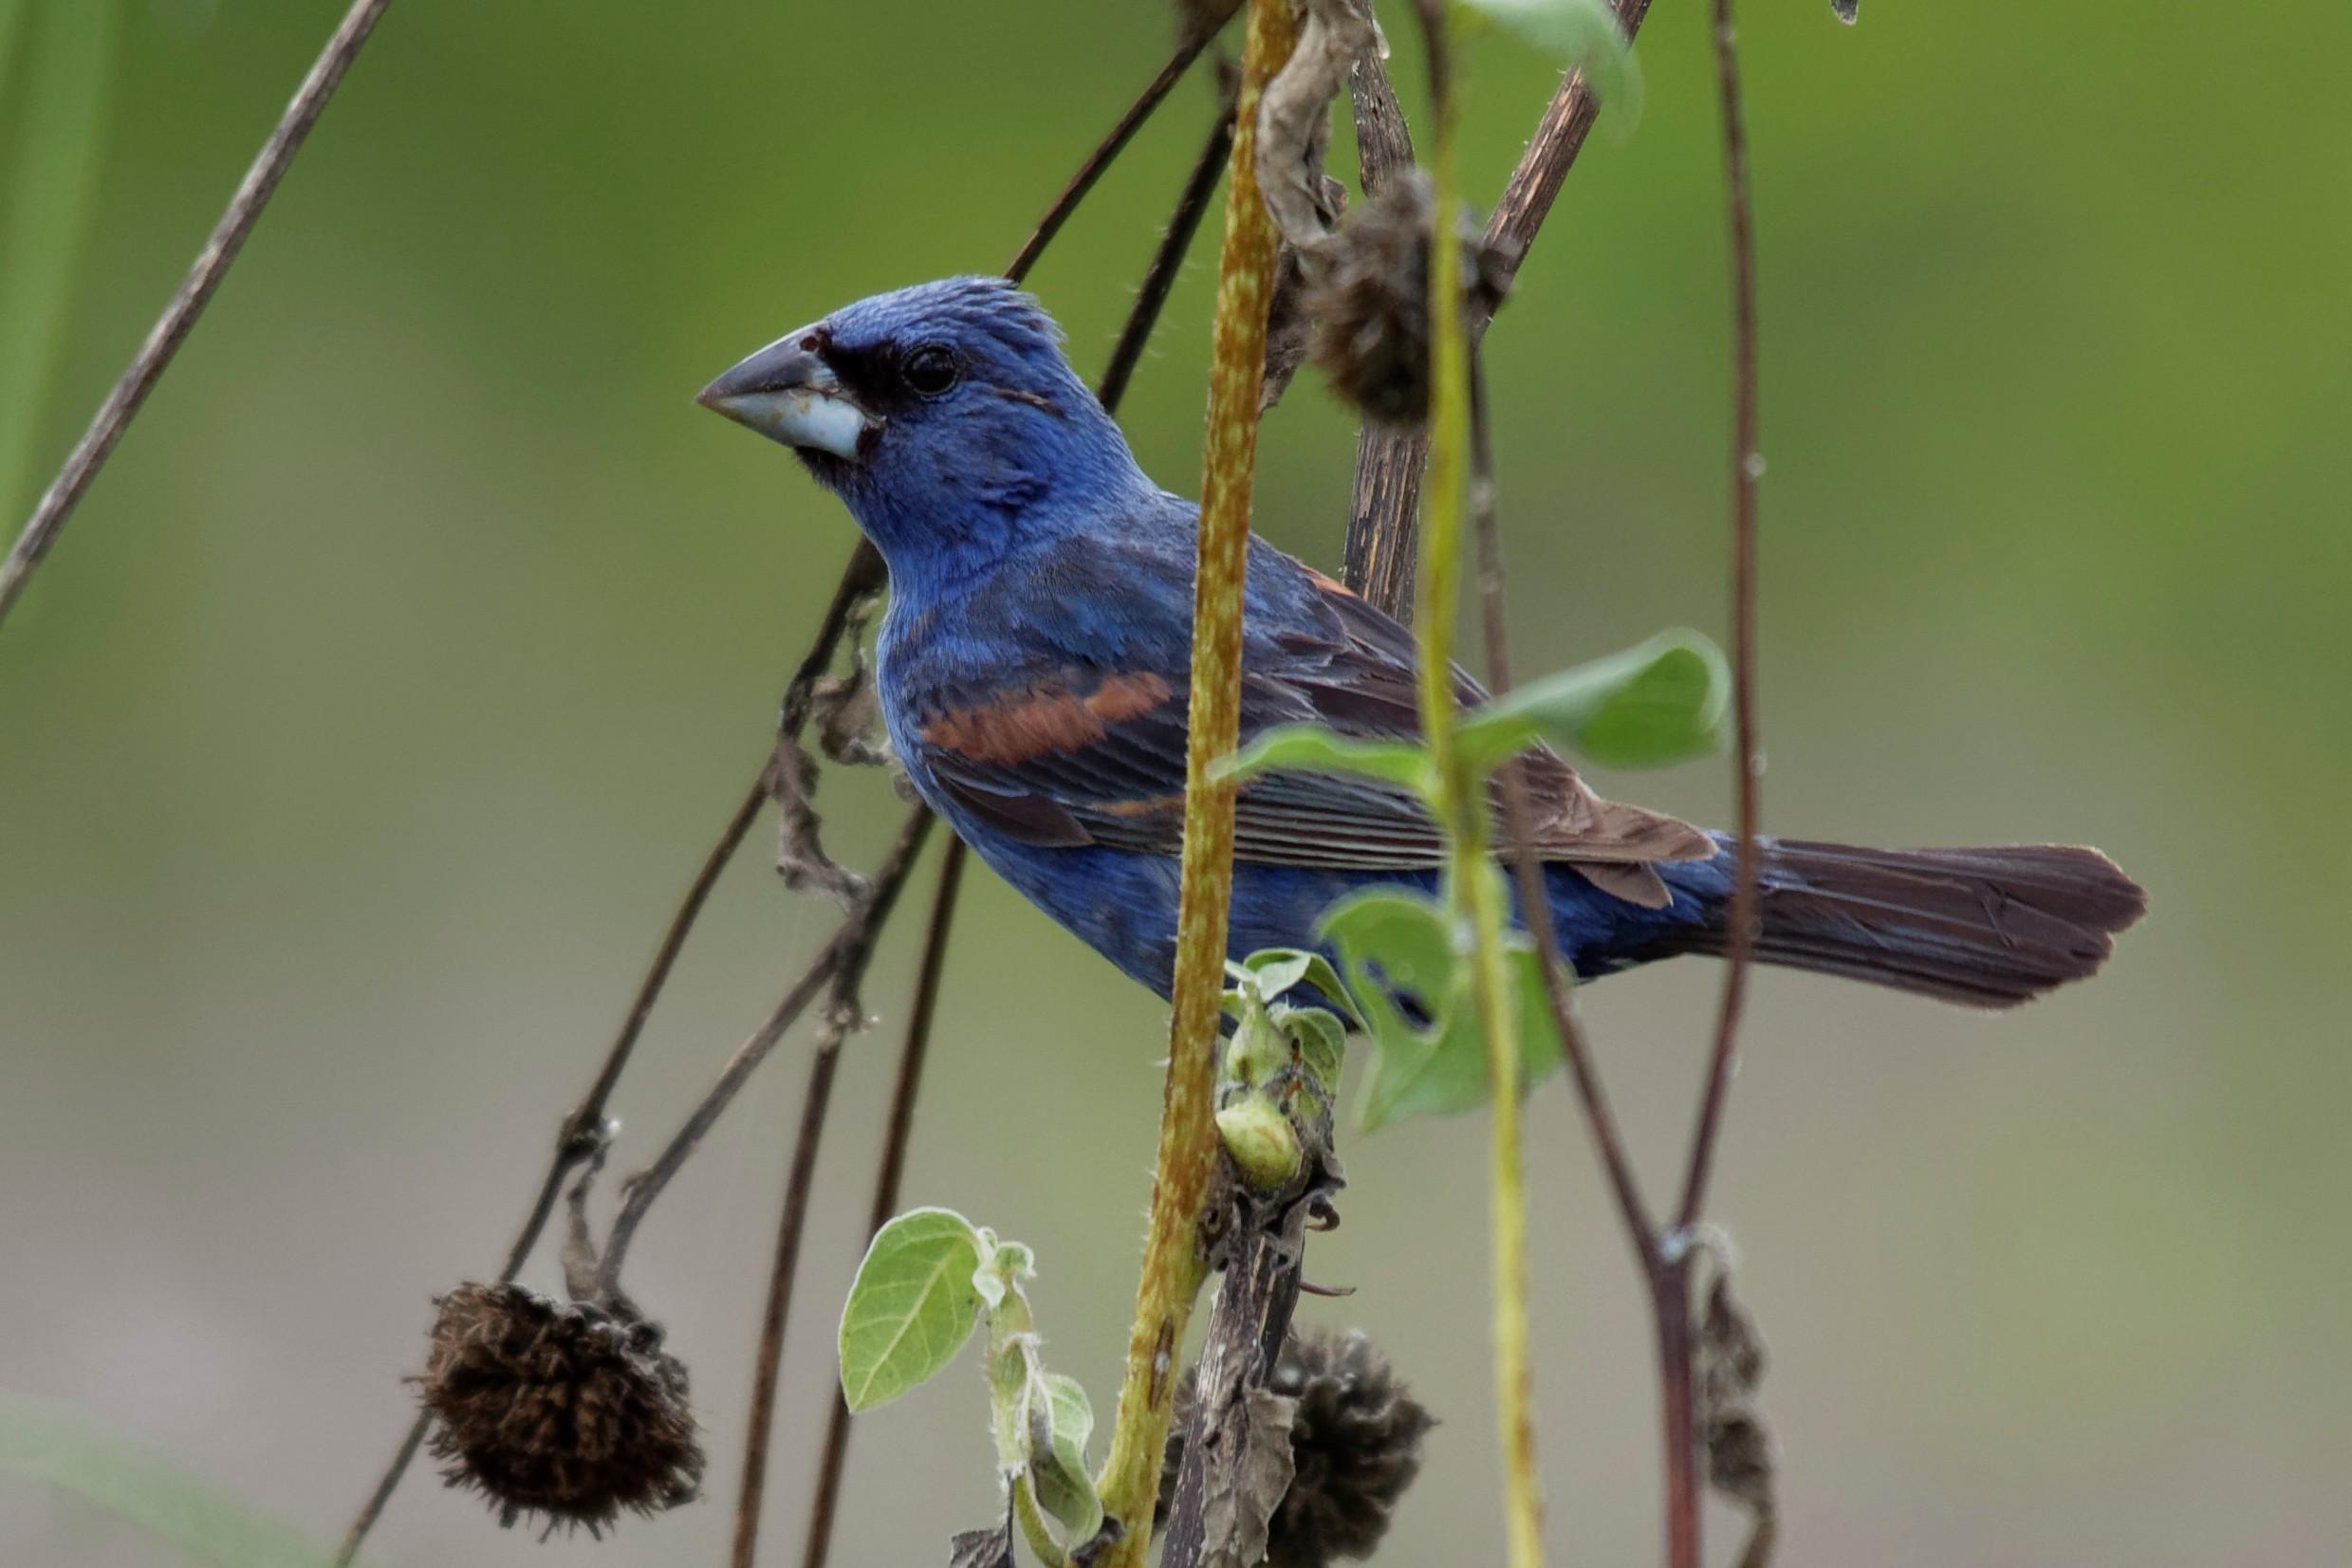 Species: Blue Grosbeak Photo Credit: Dina Perry Date: September 2018 Location: Mitchell Lake Audubon Center